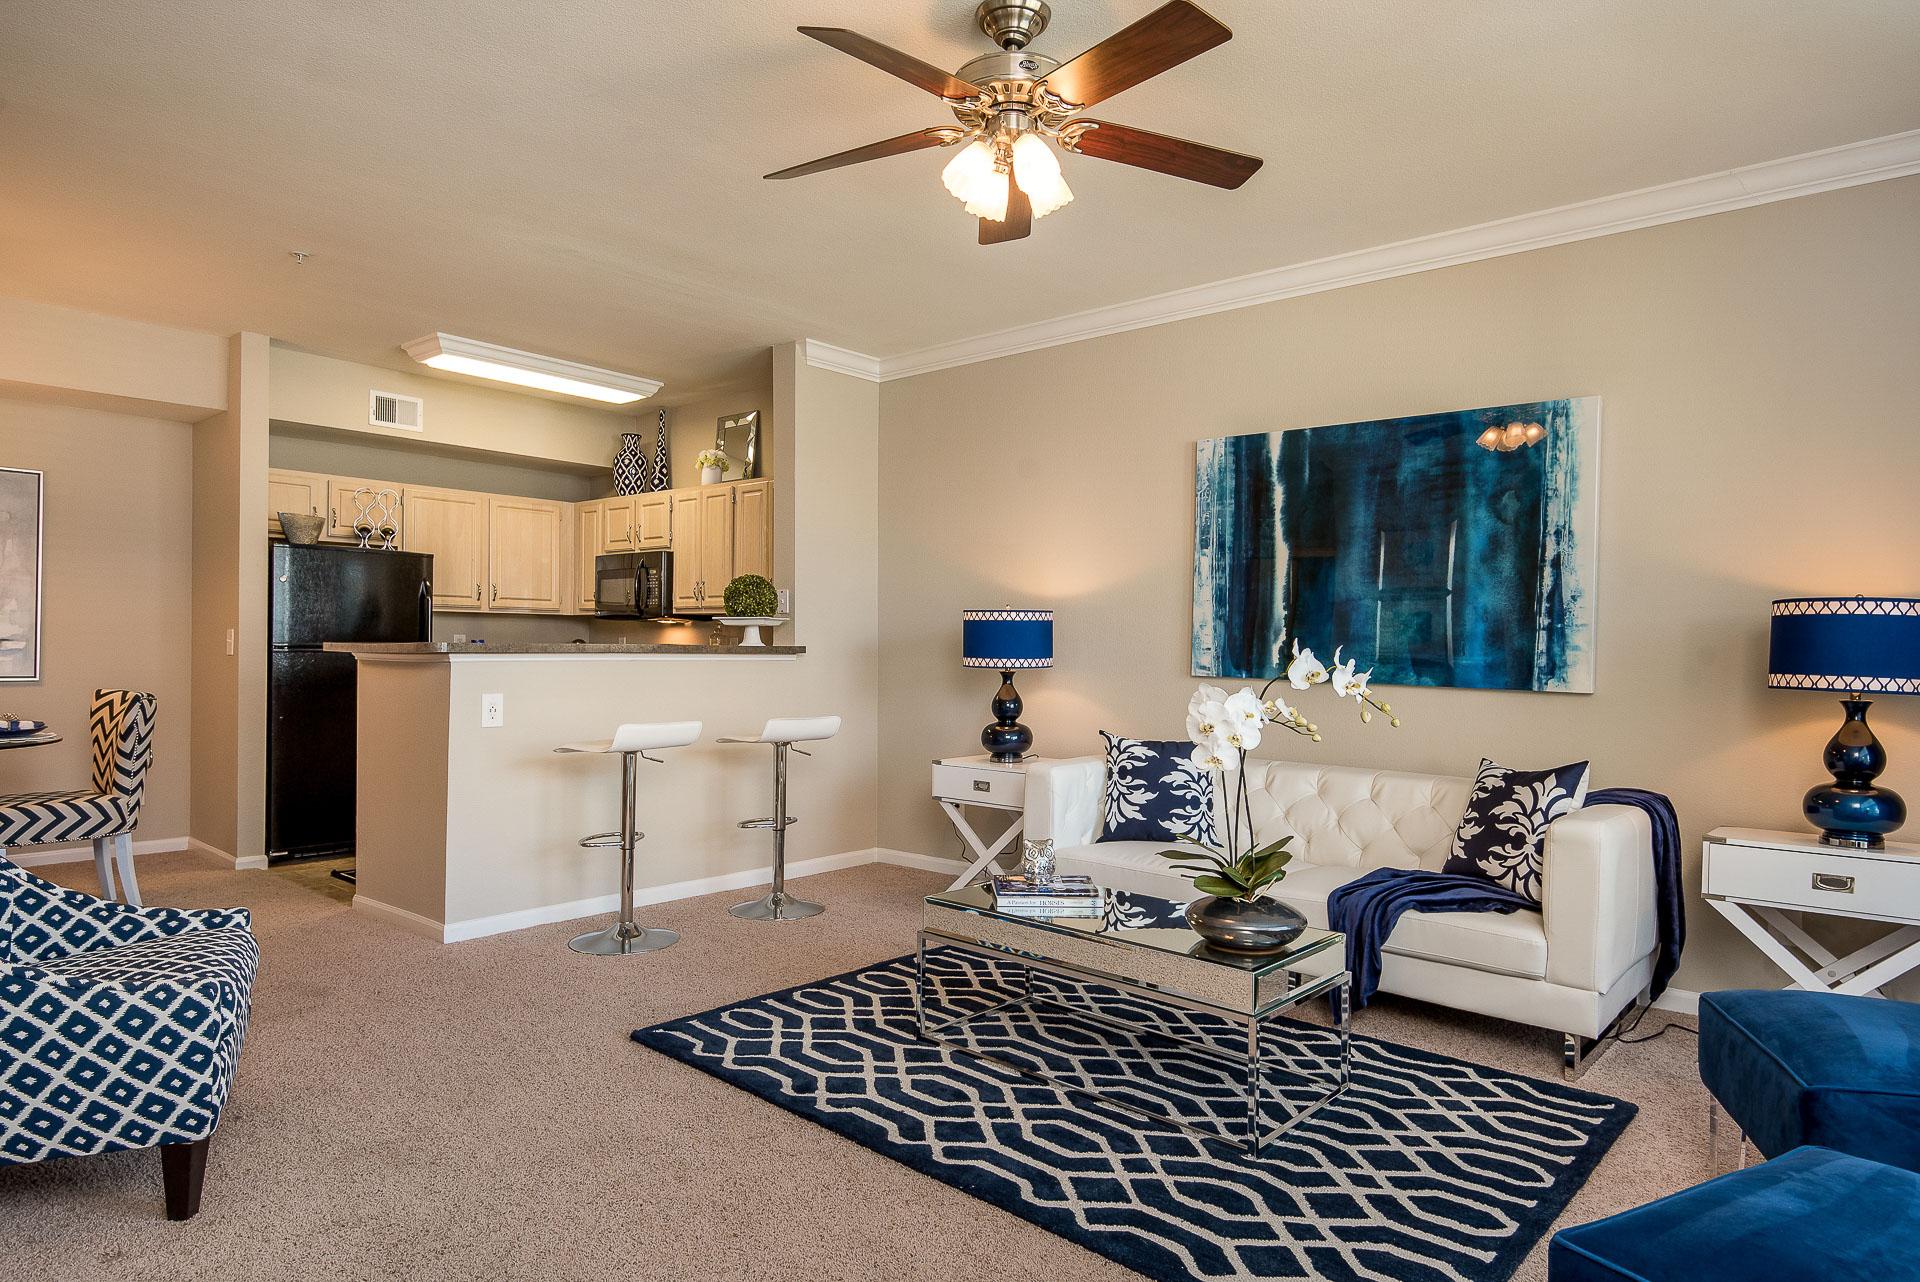 Sherpa Media Kansas City - Apartments & Multi-Family Housing - 31